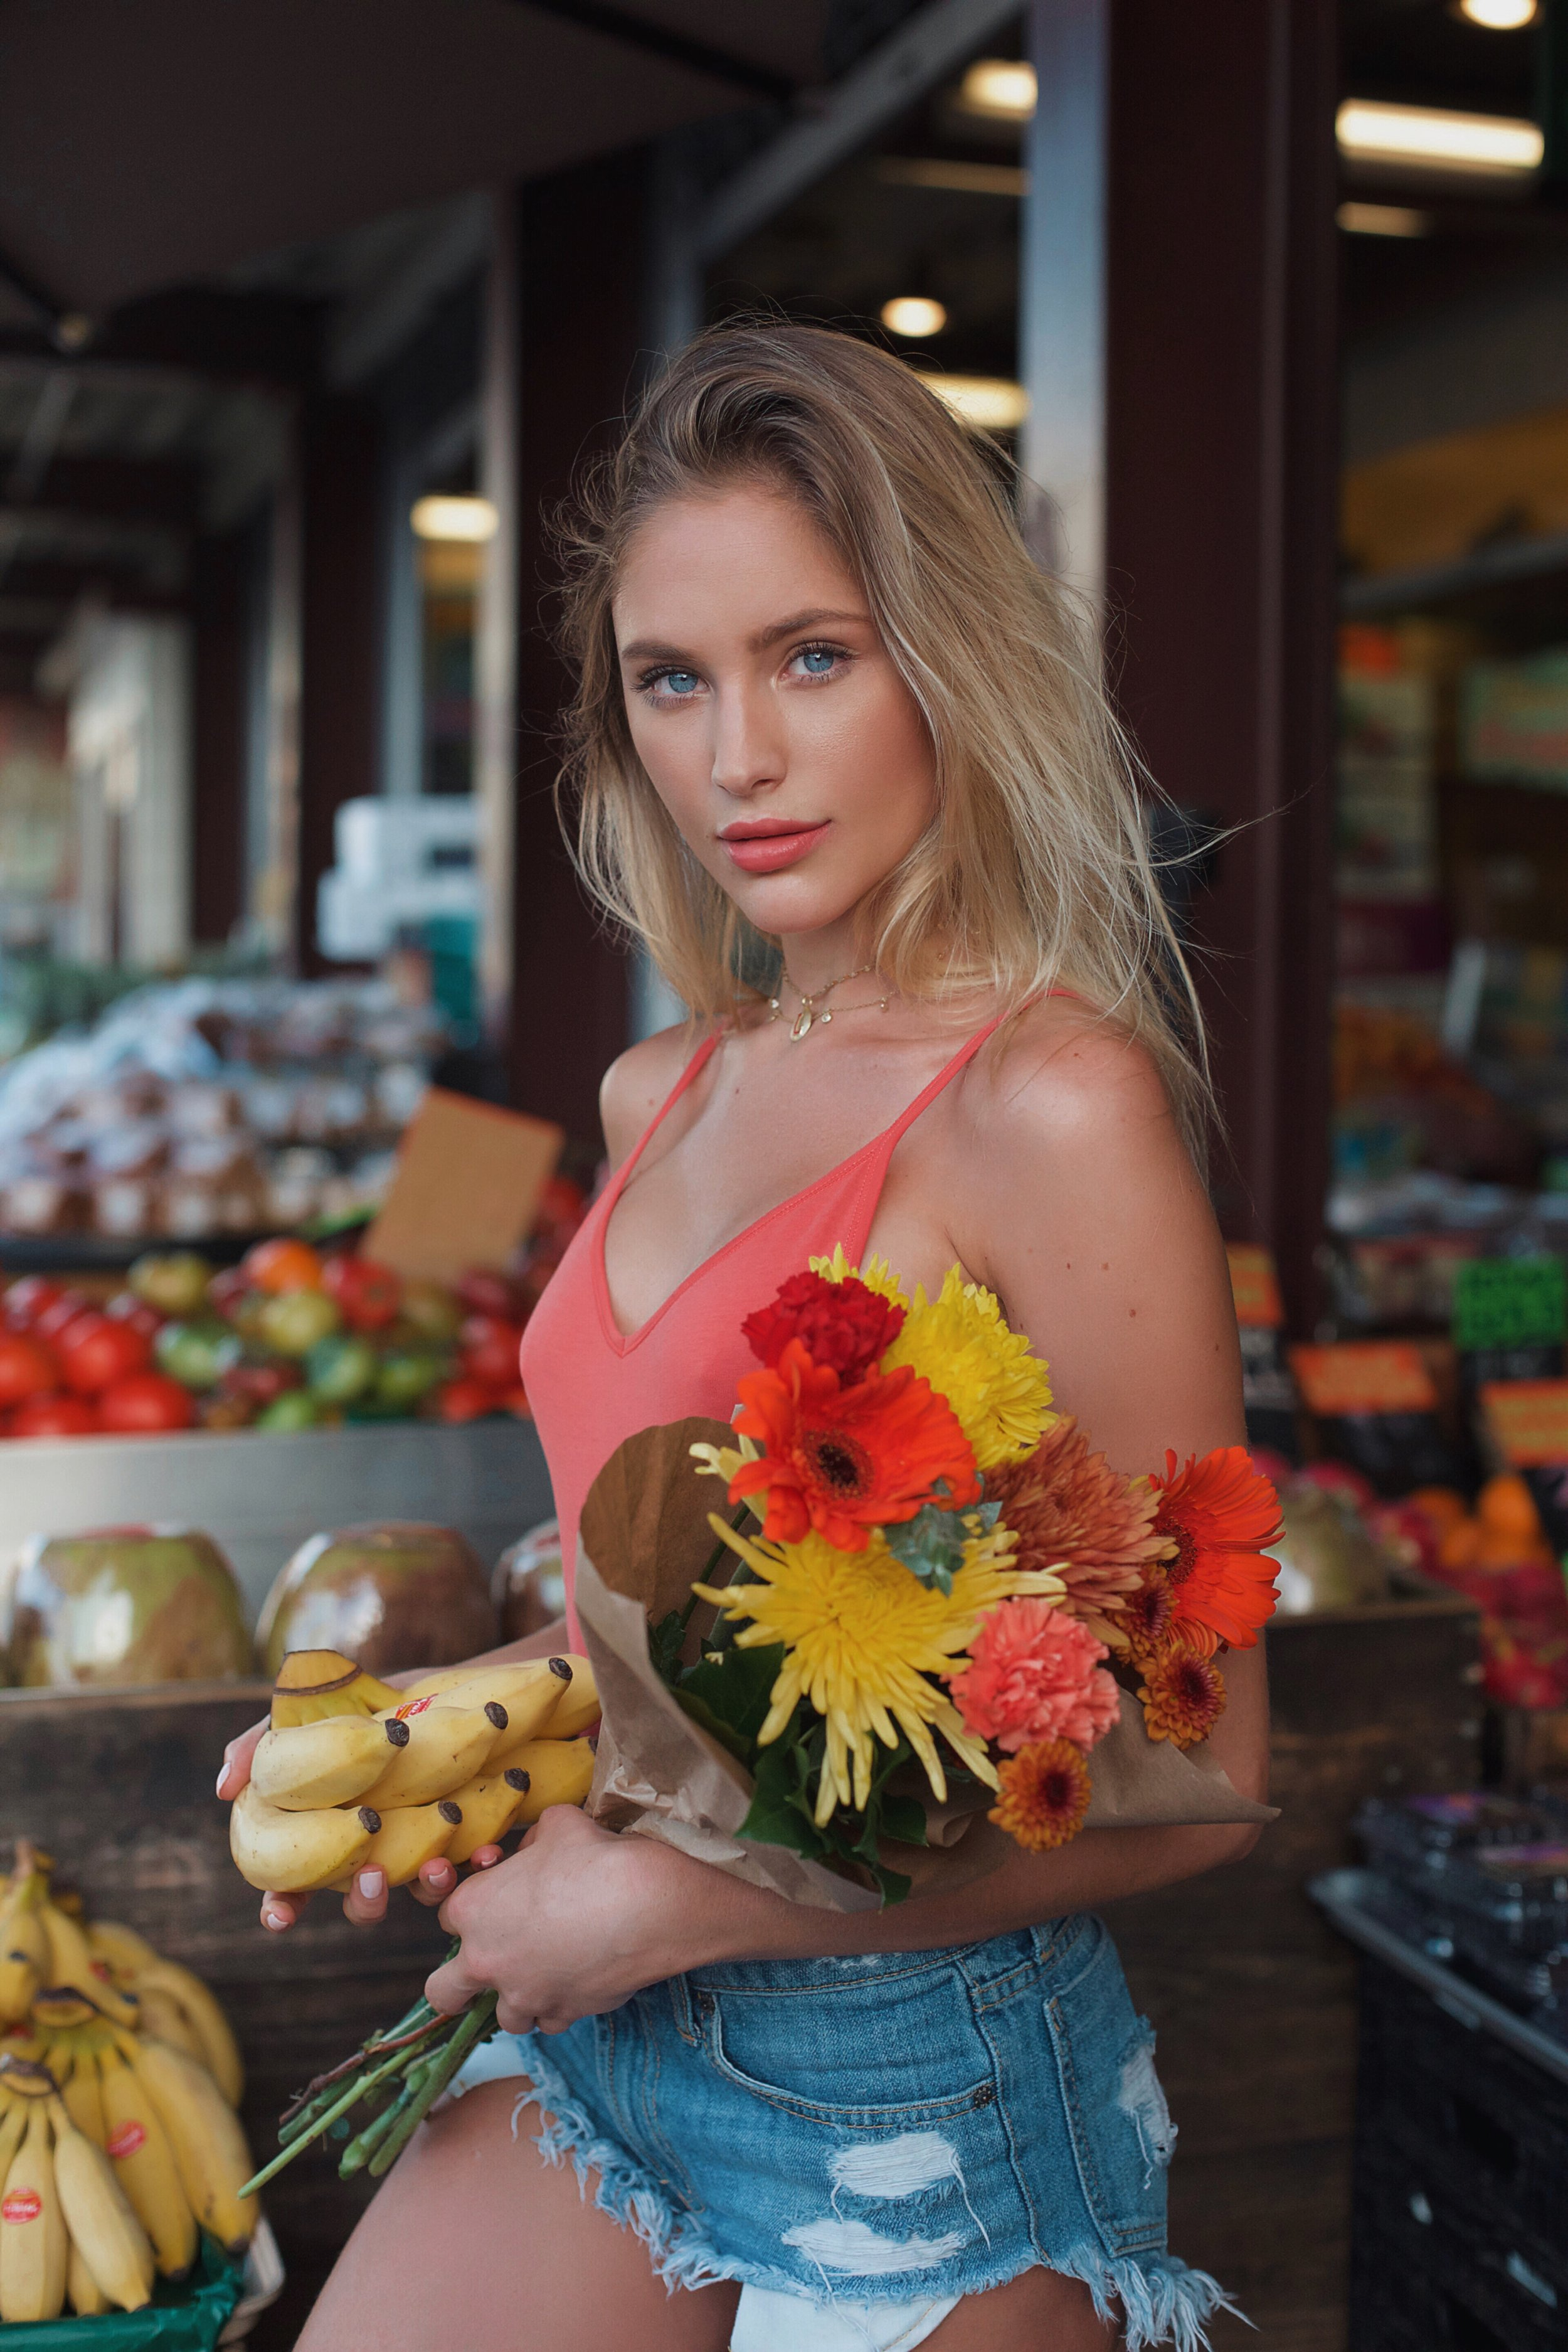 Farmers Market holding flowers.JPG